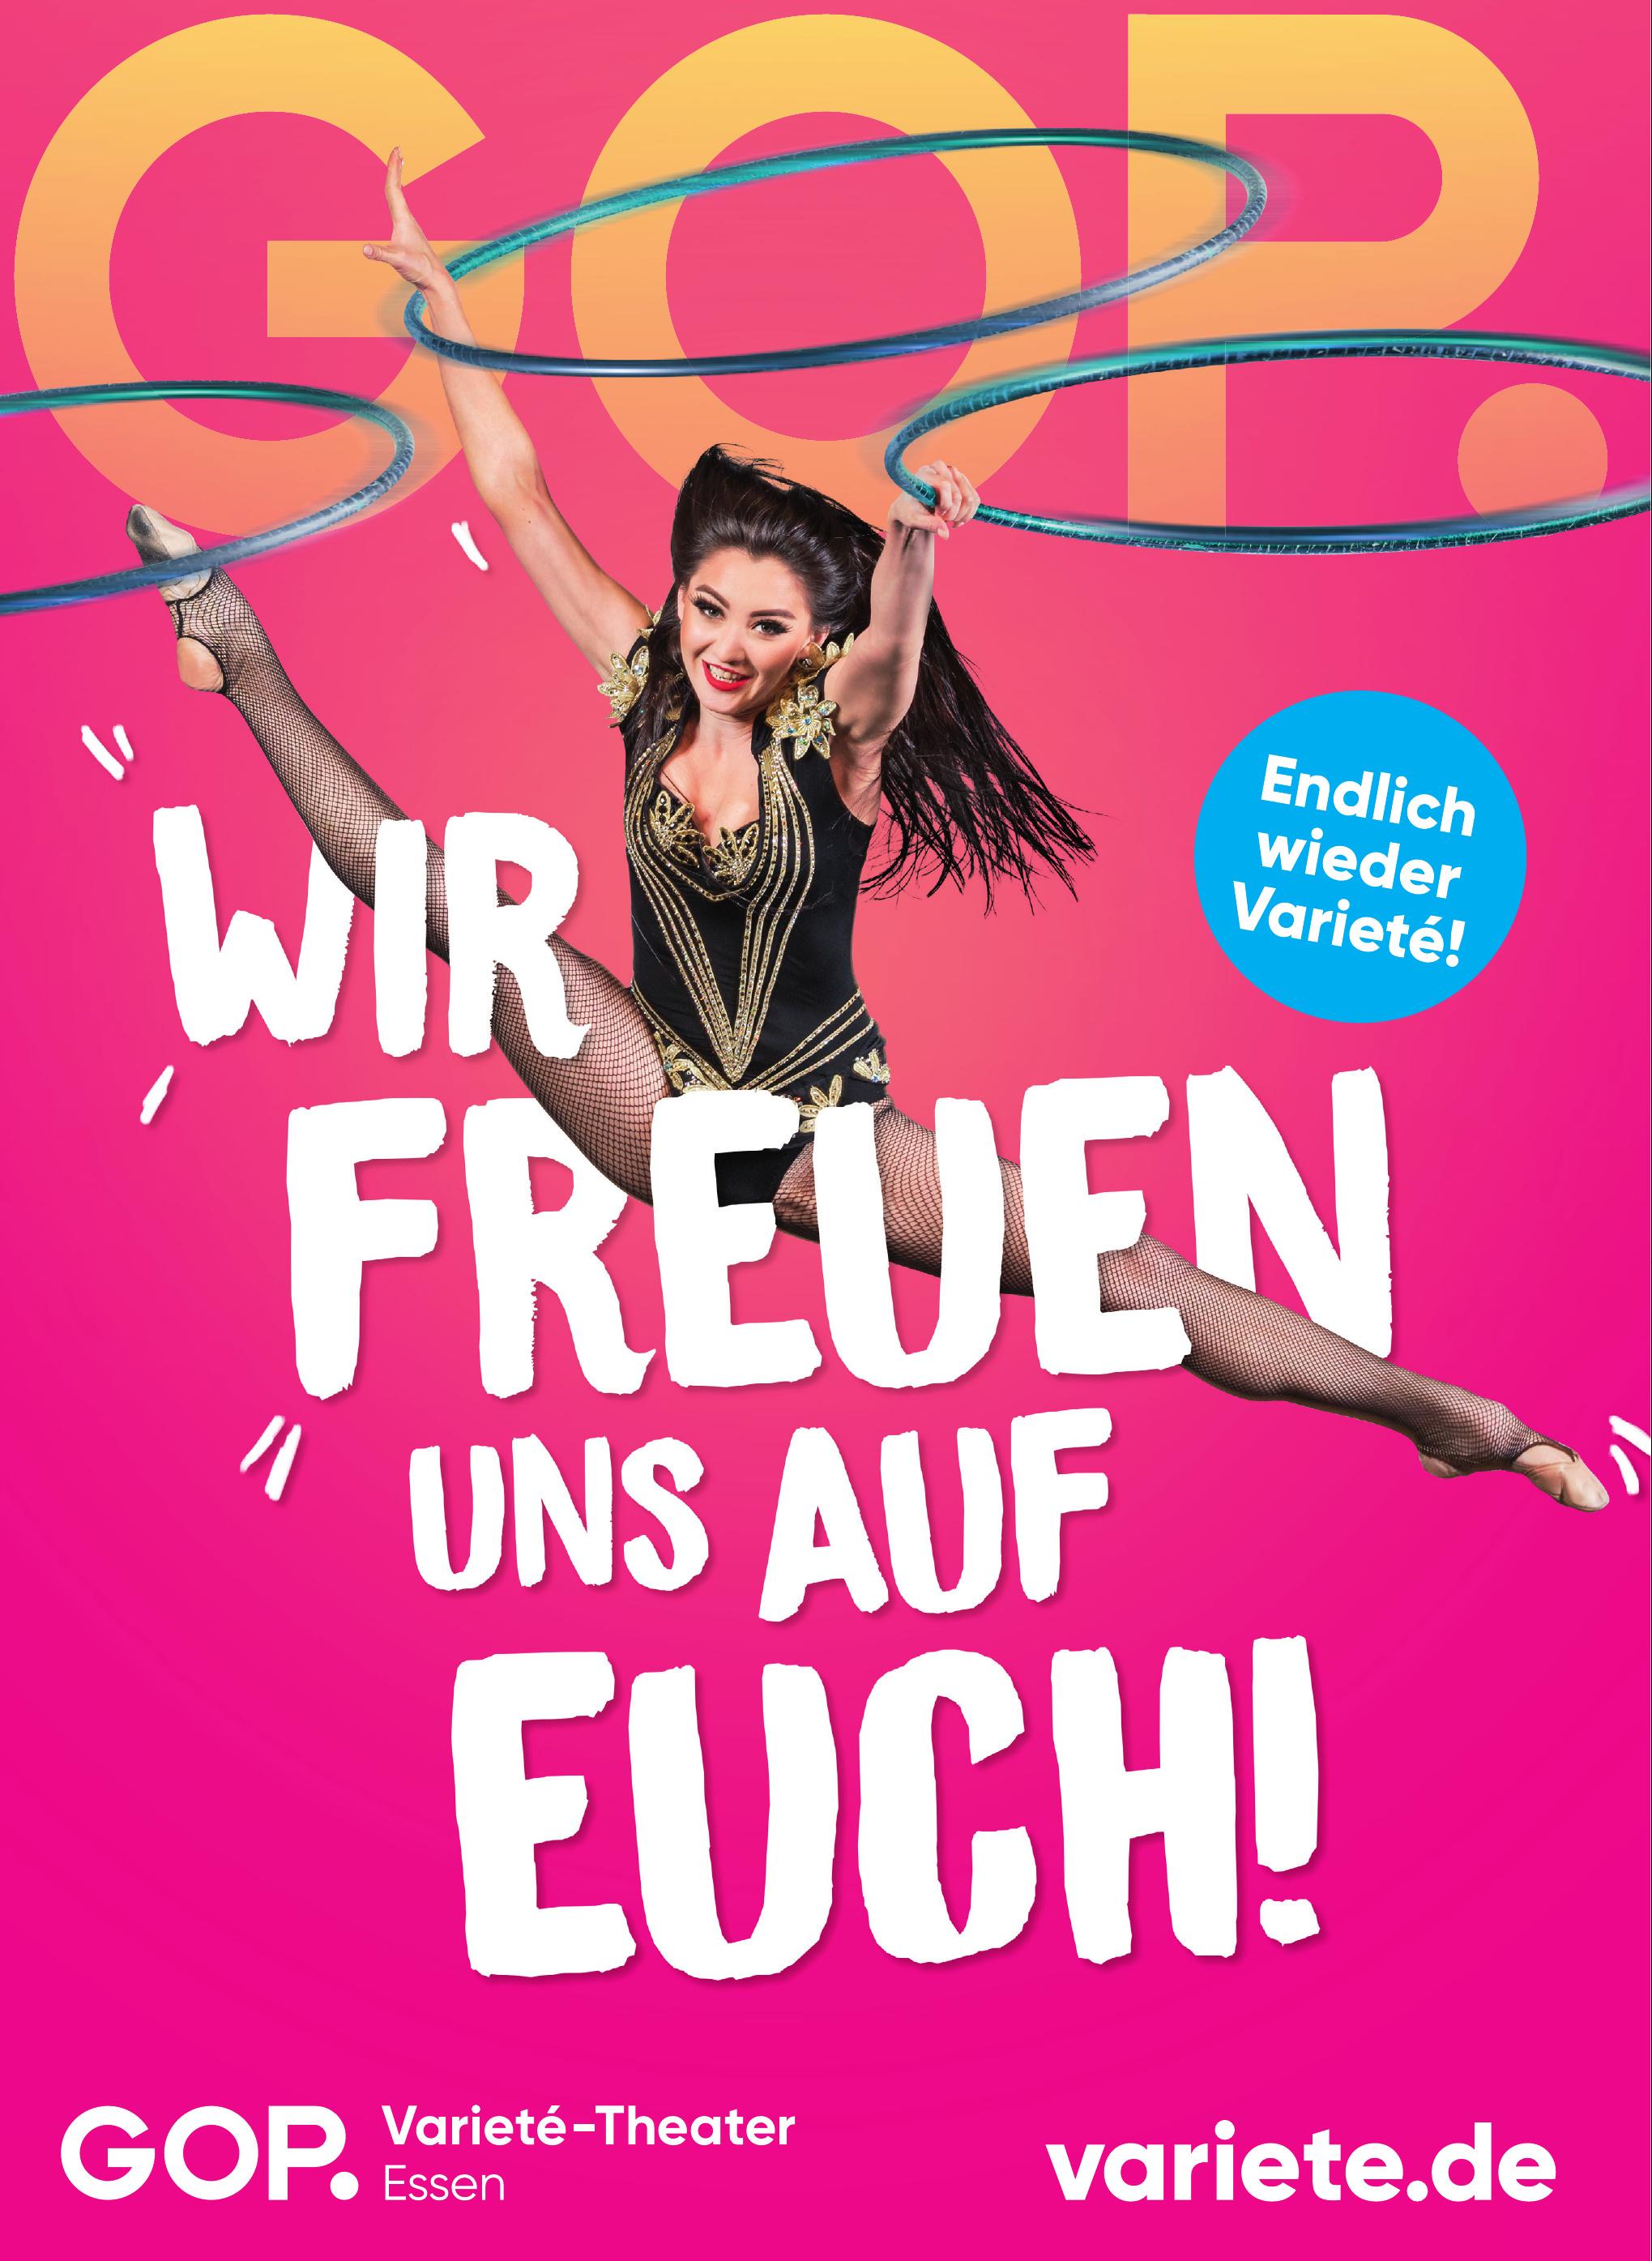 GOP Entertainment Group GmbH & CO. KG